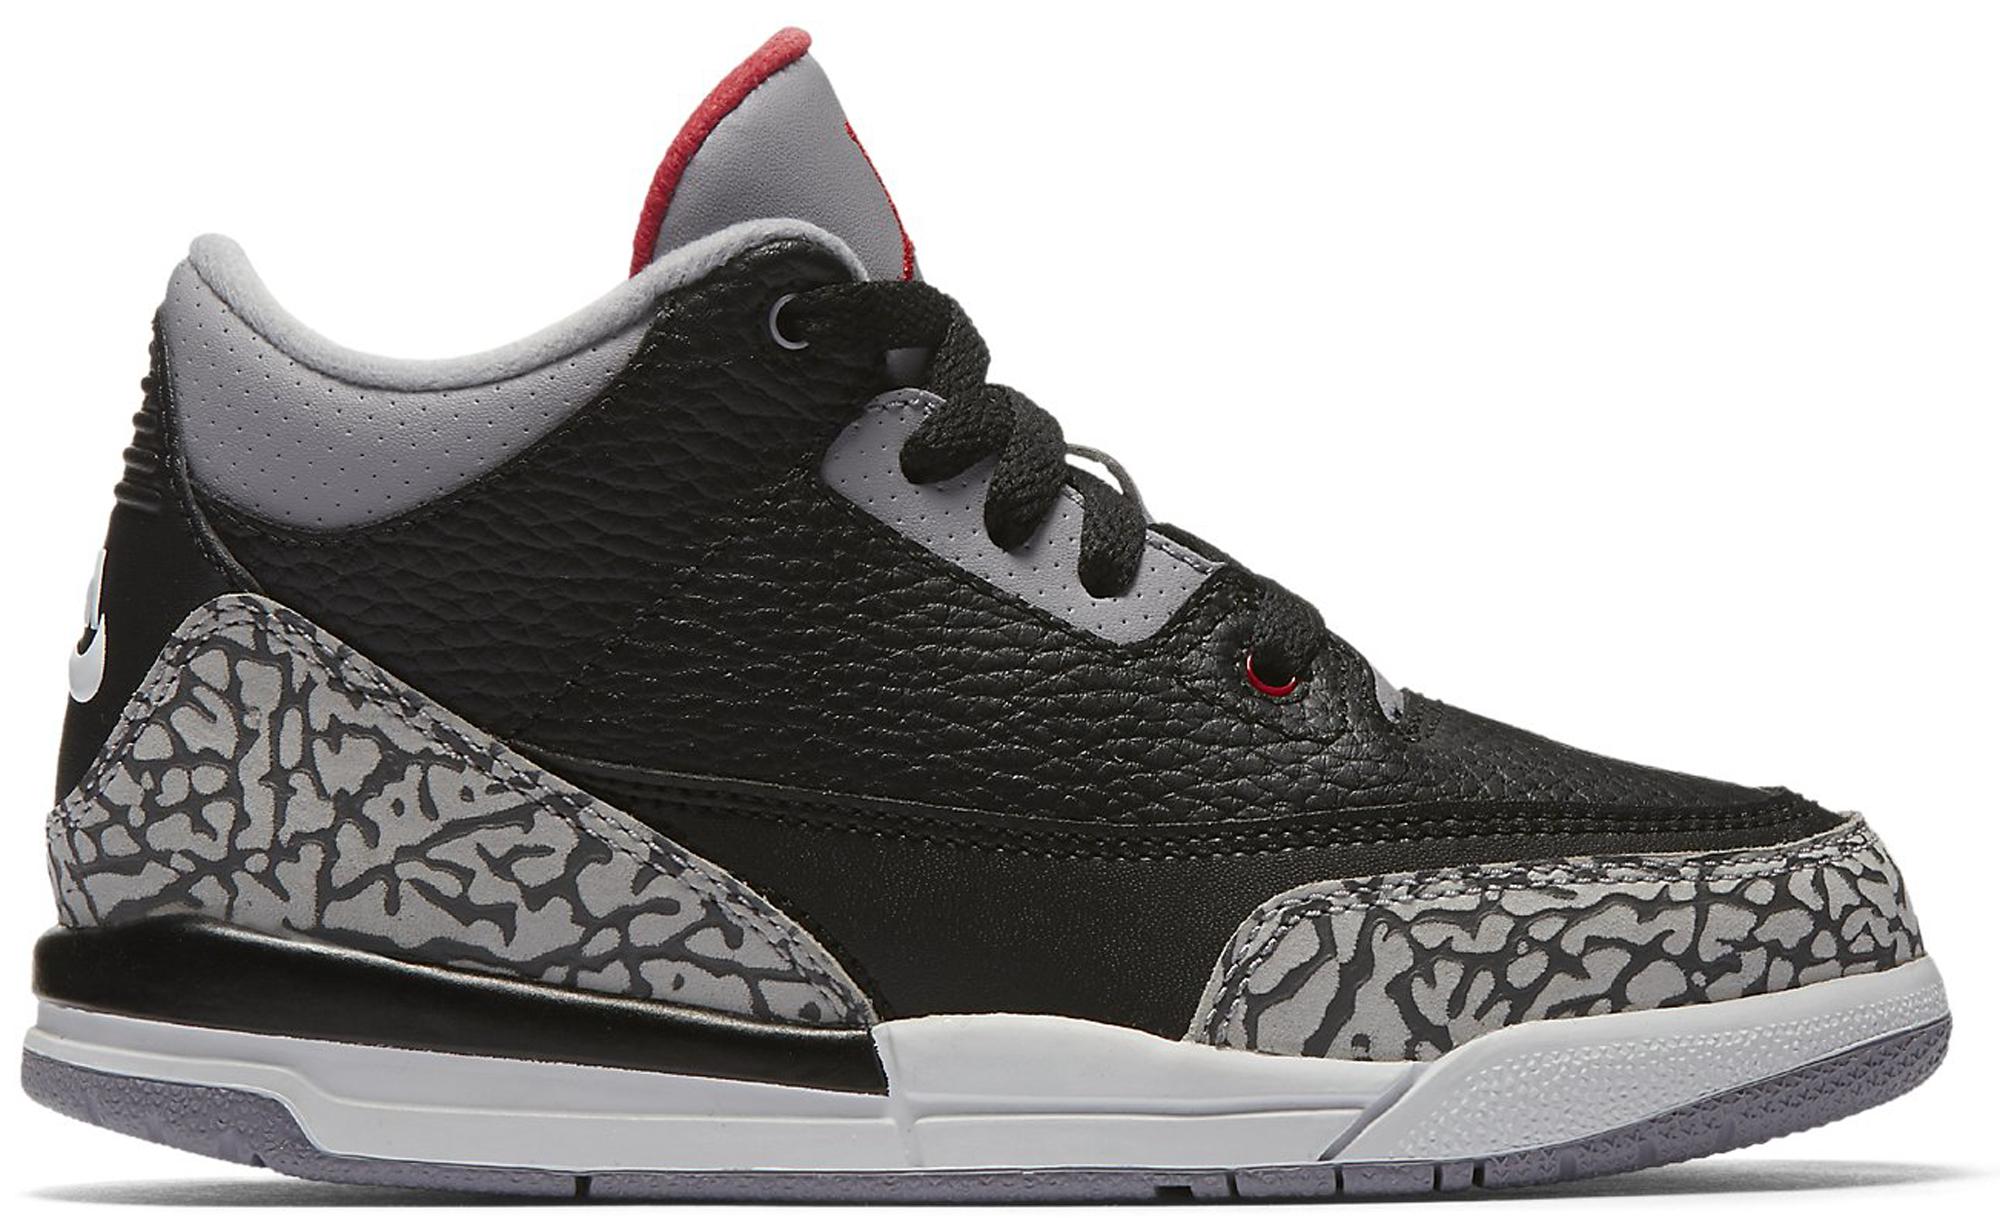 Jordan 3 Retro Black Cement 2018 (PS)